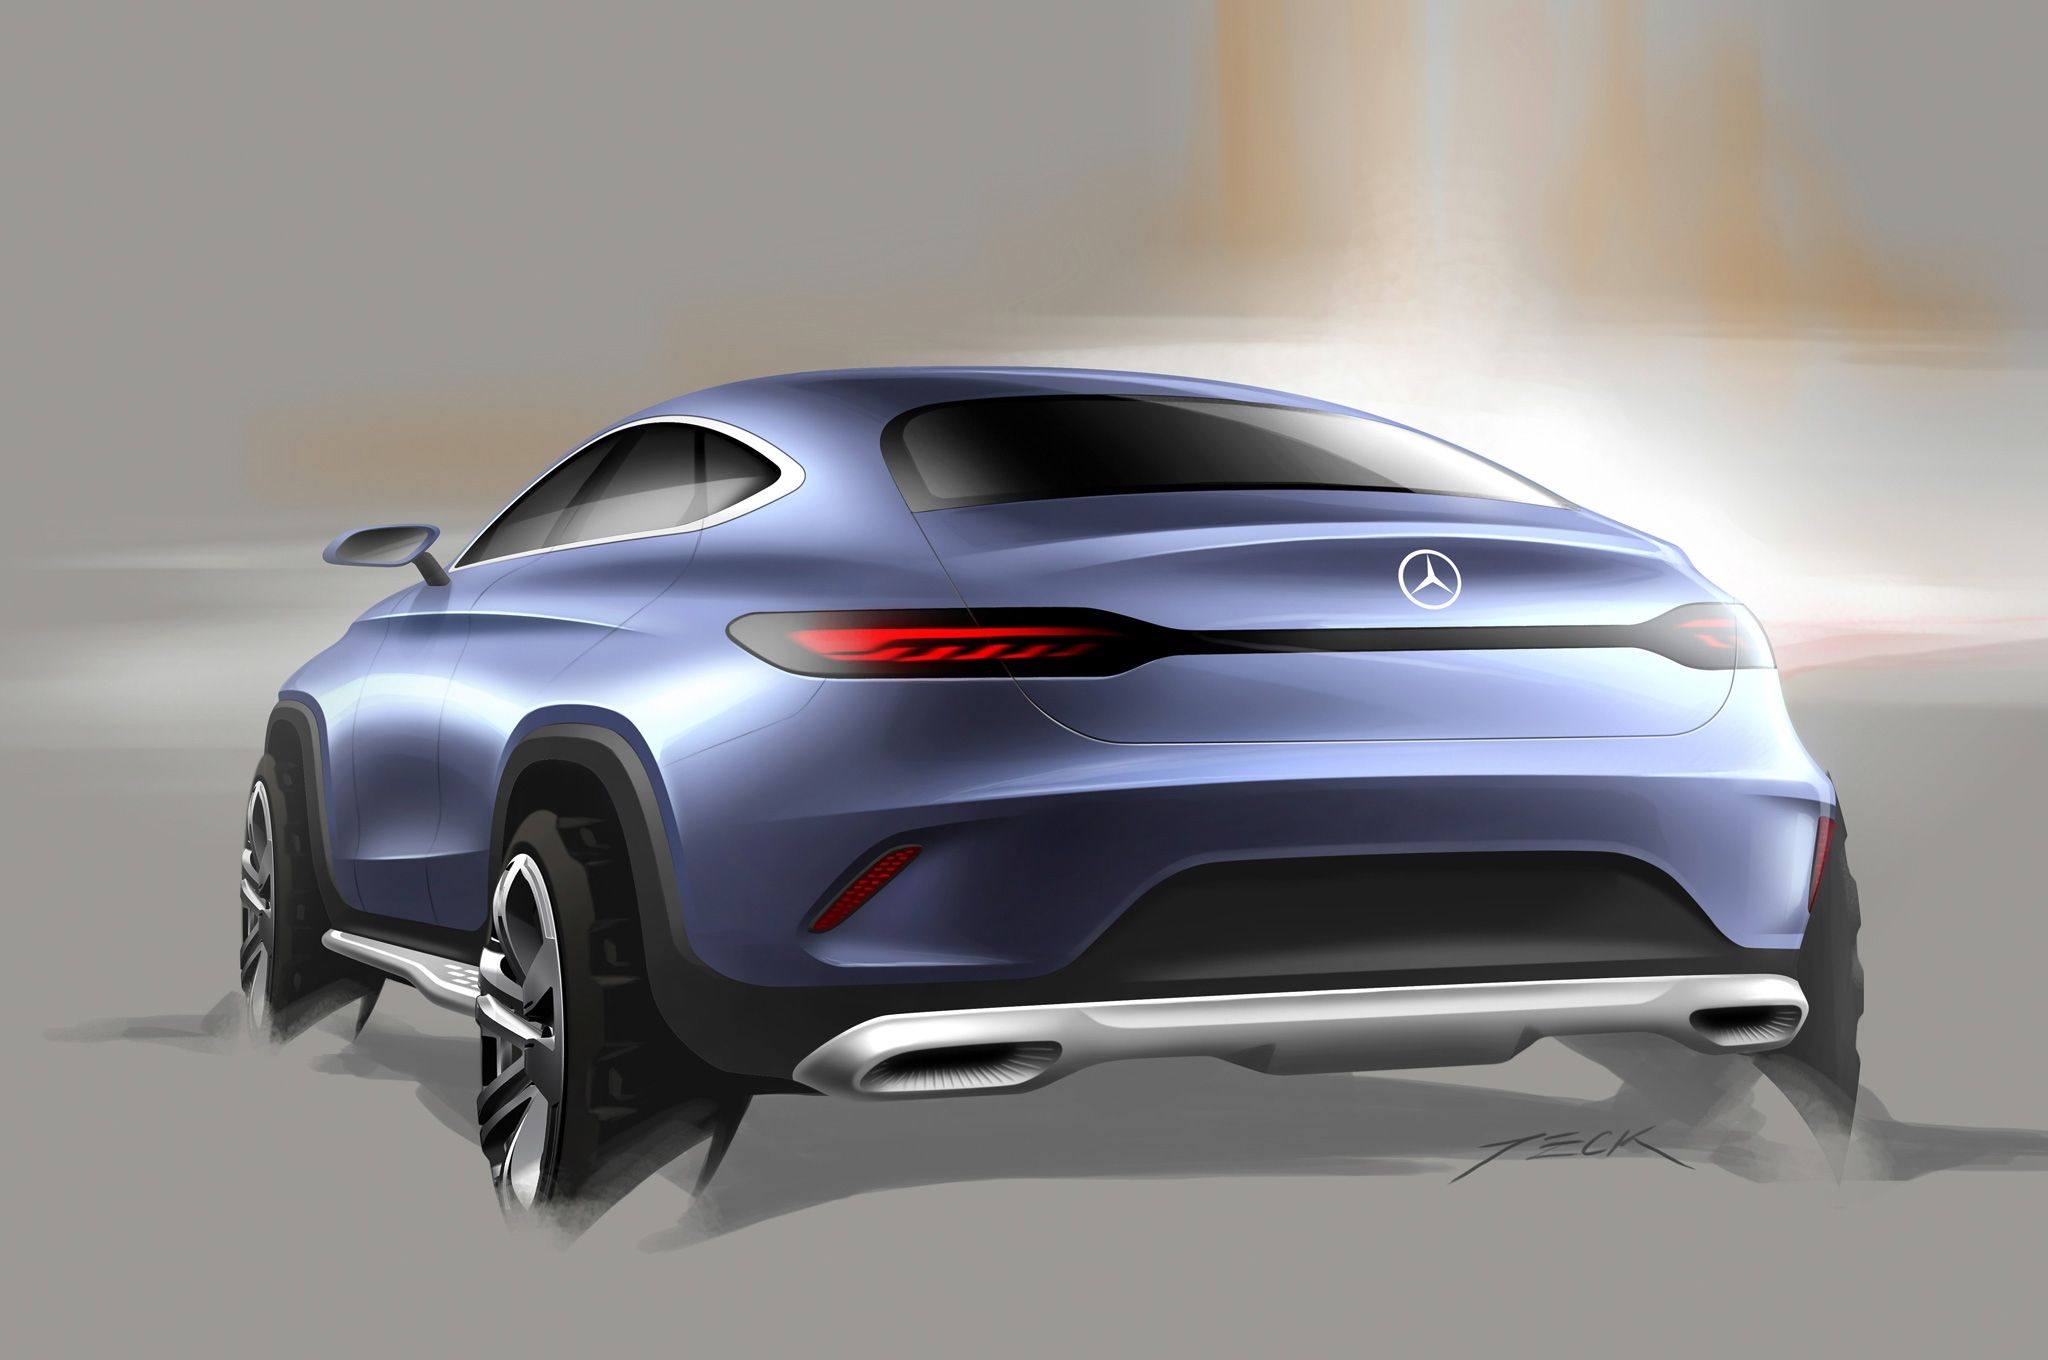 concept suv Google 검색 自動車, 汽车, 車